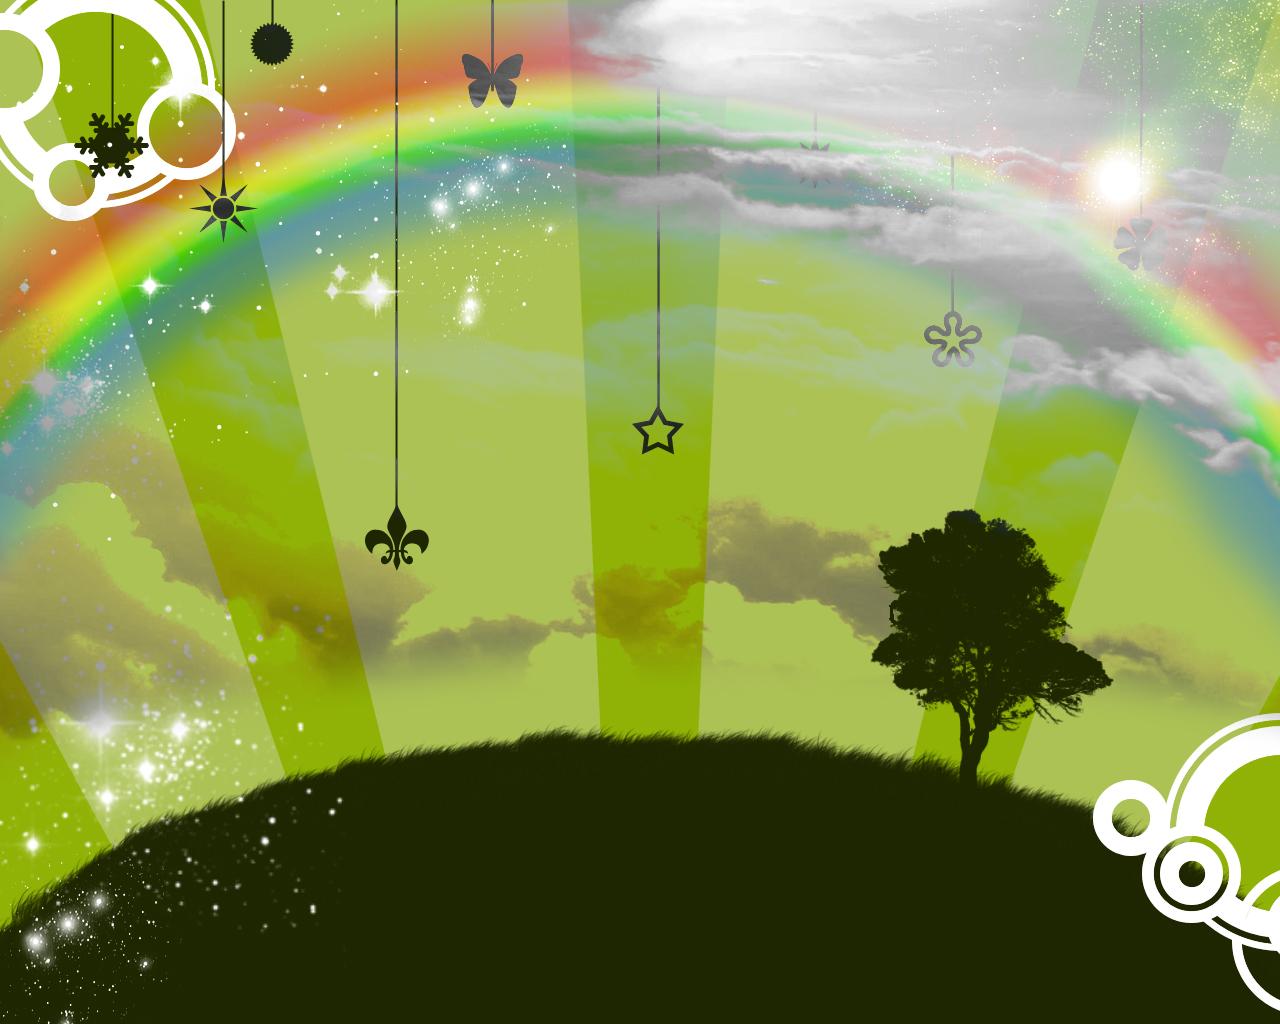 http://4.bp.blogspot.com/_14grgzfQGYA/TOx3I6mOcUI/AAAAAAAACBQ/EoWv4n6aST4/s1600/14-Colorful-wallpaper-1280X1024.jpg